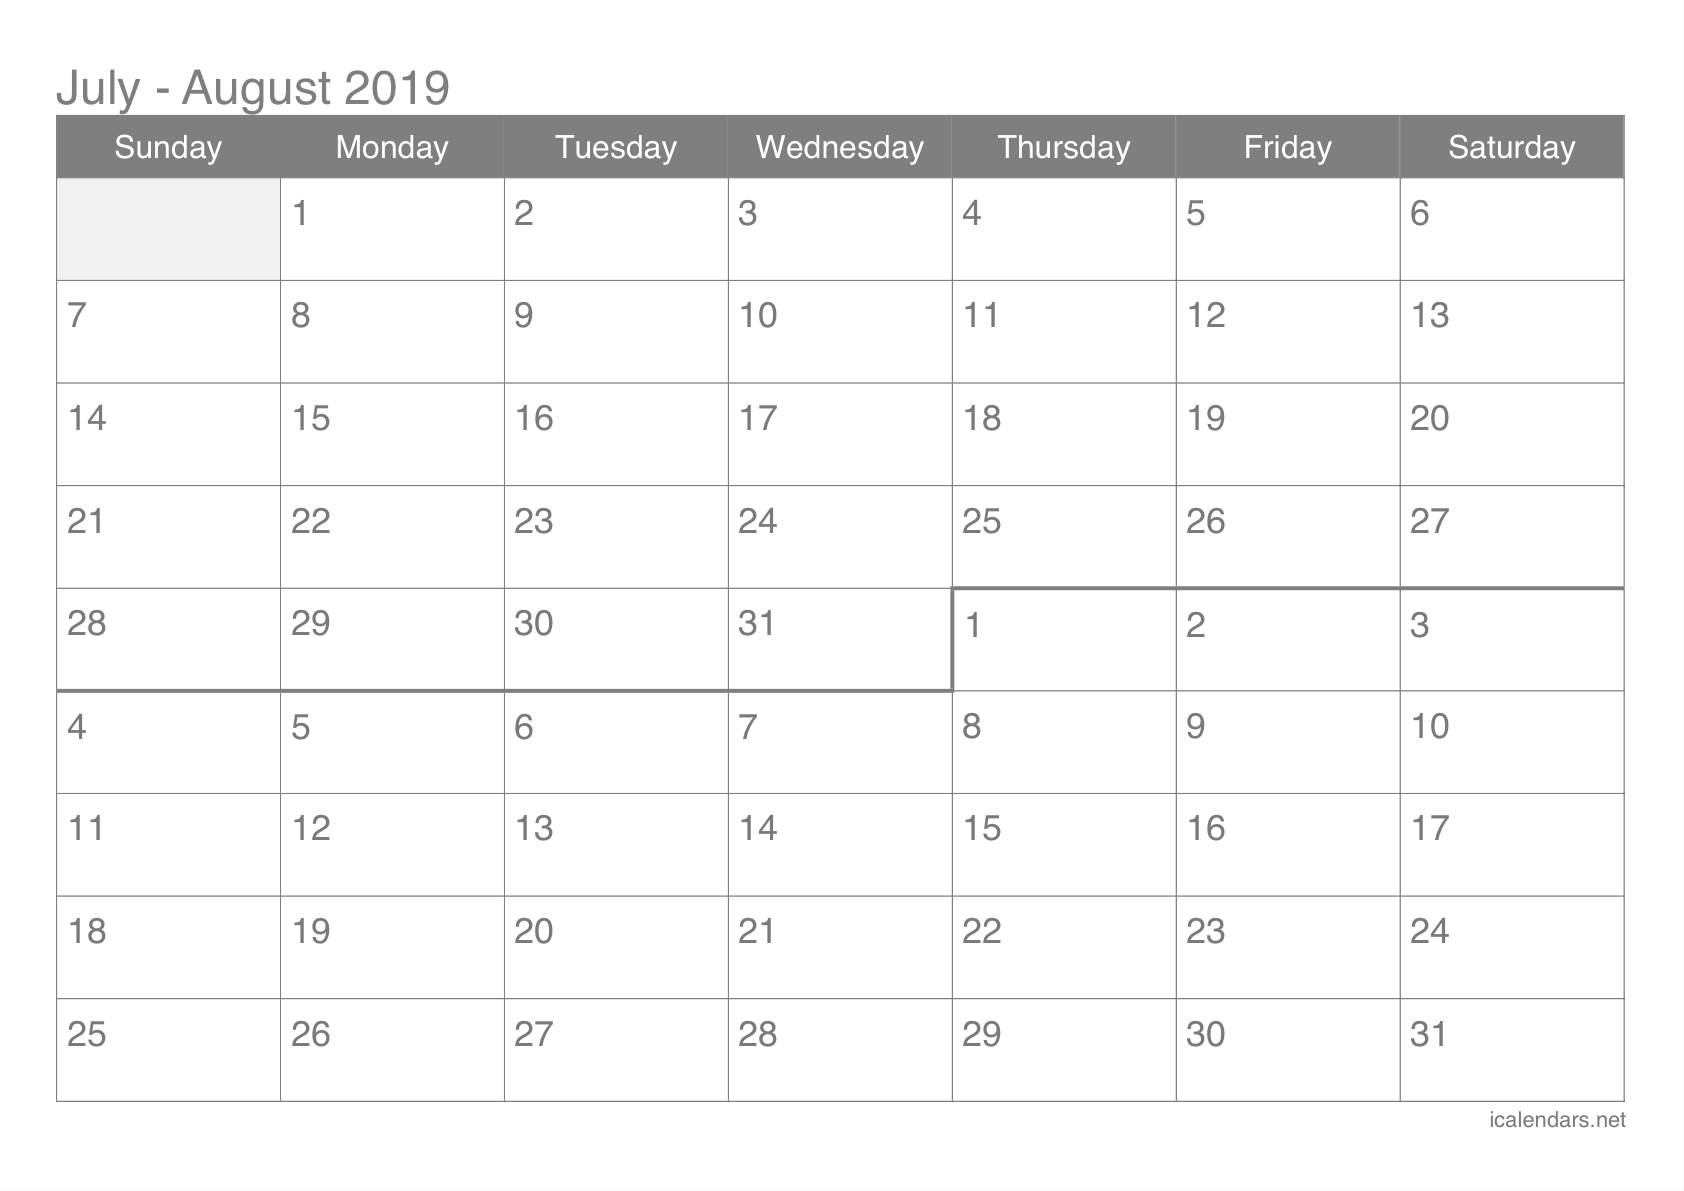 July And August 2019 Printable Calendar - Icalendars inside Blank Calendar June July August